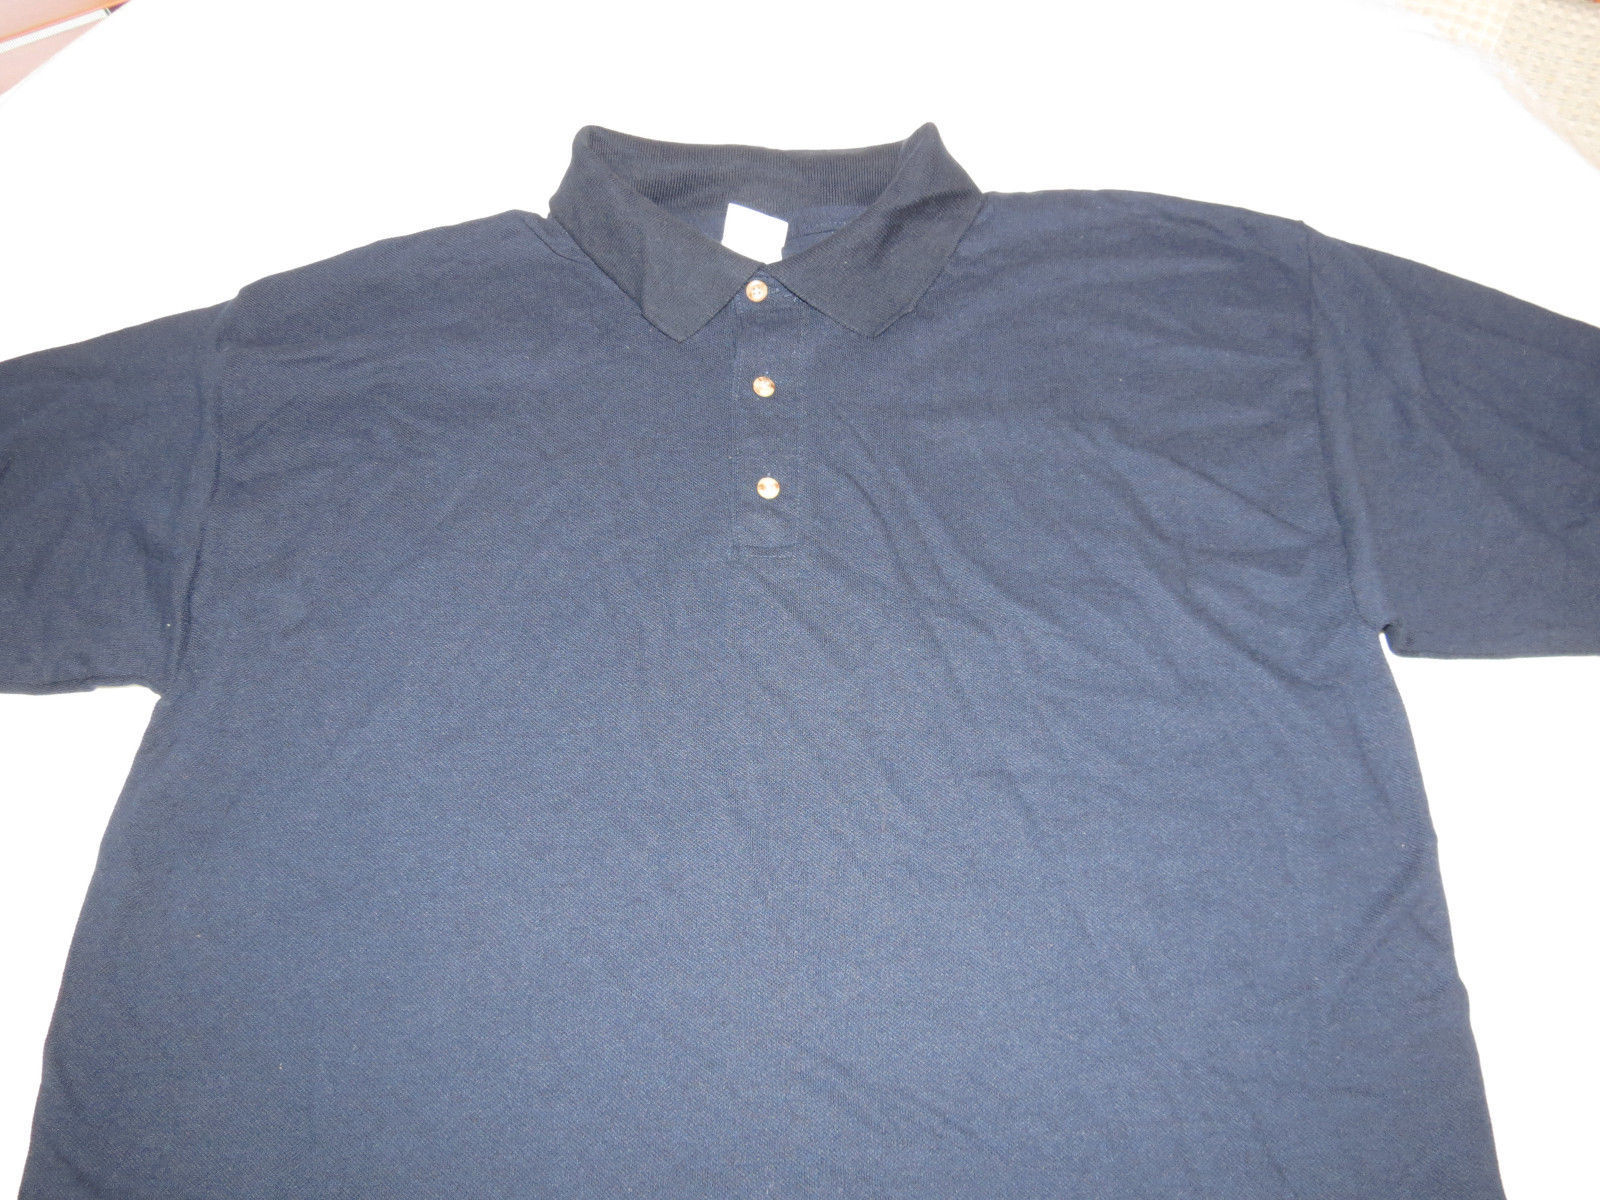 Gildan Activewear Ultrablend Heavyweight adult L large mens Navy polo shirt NOS